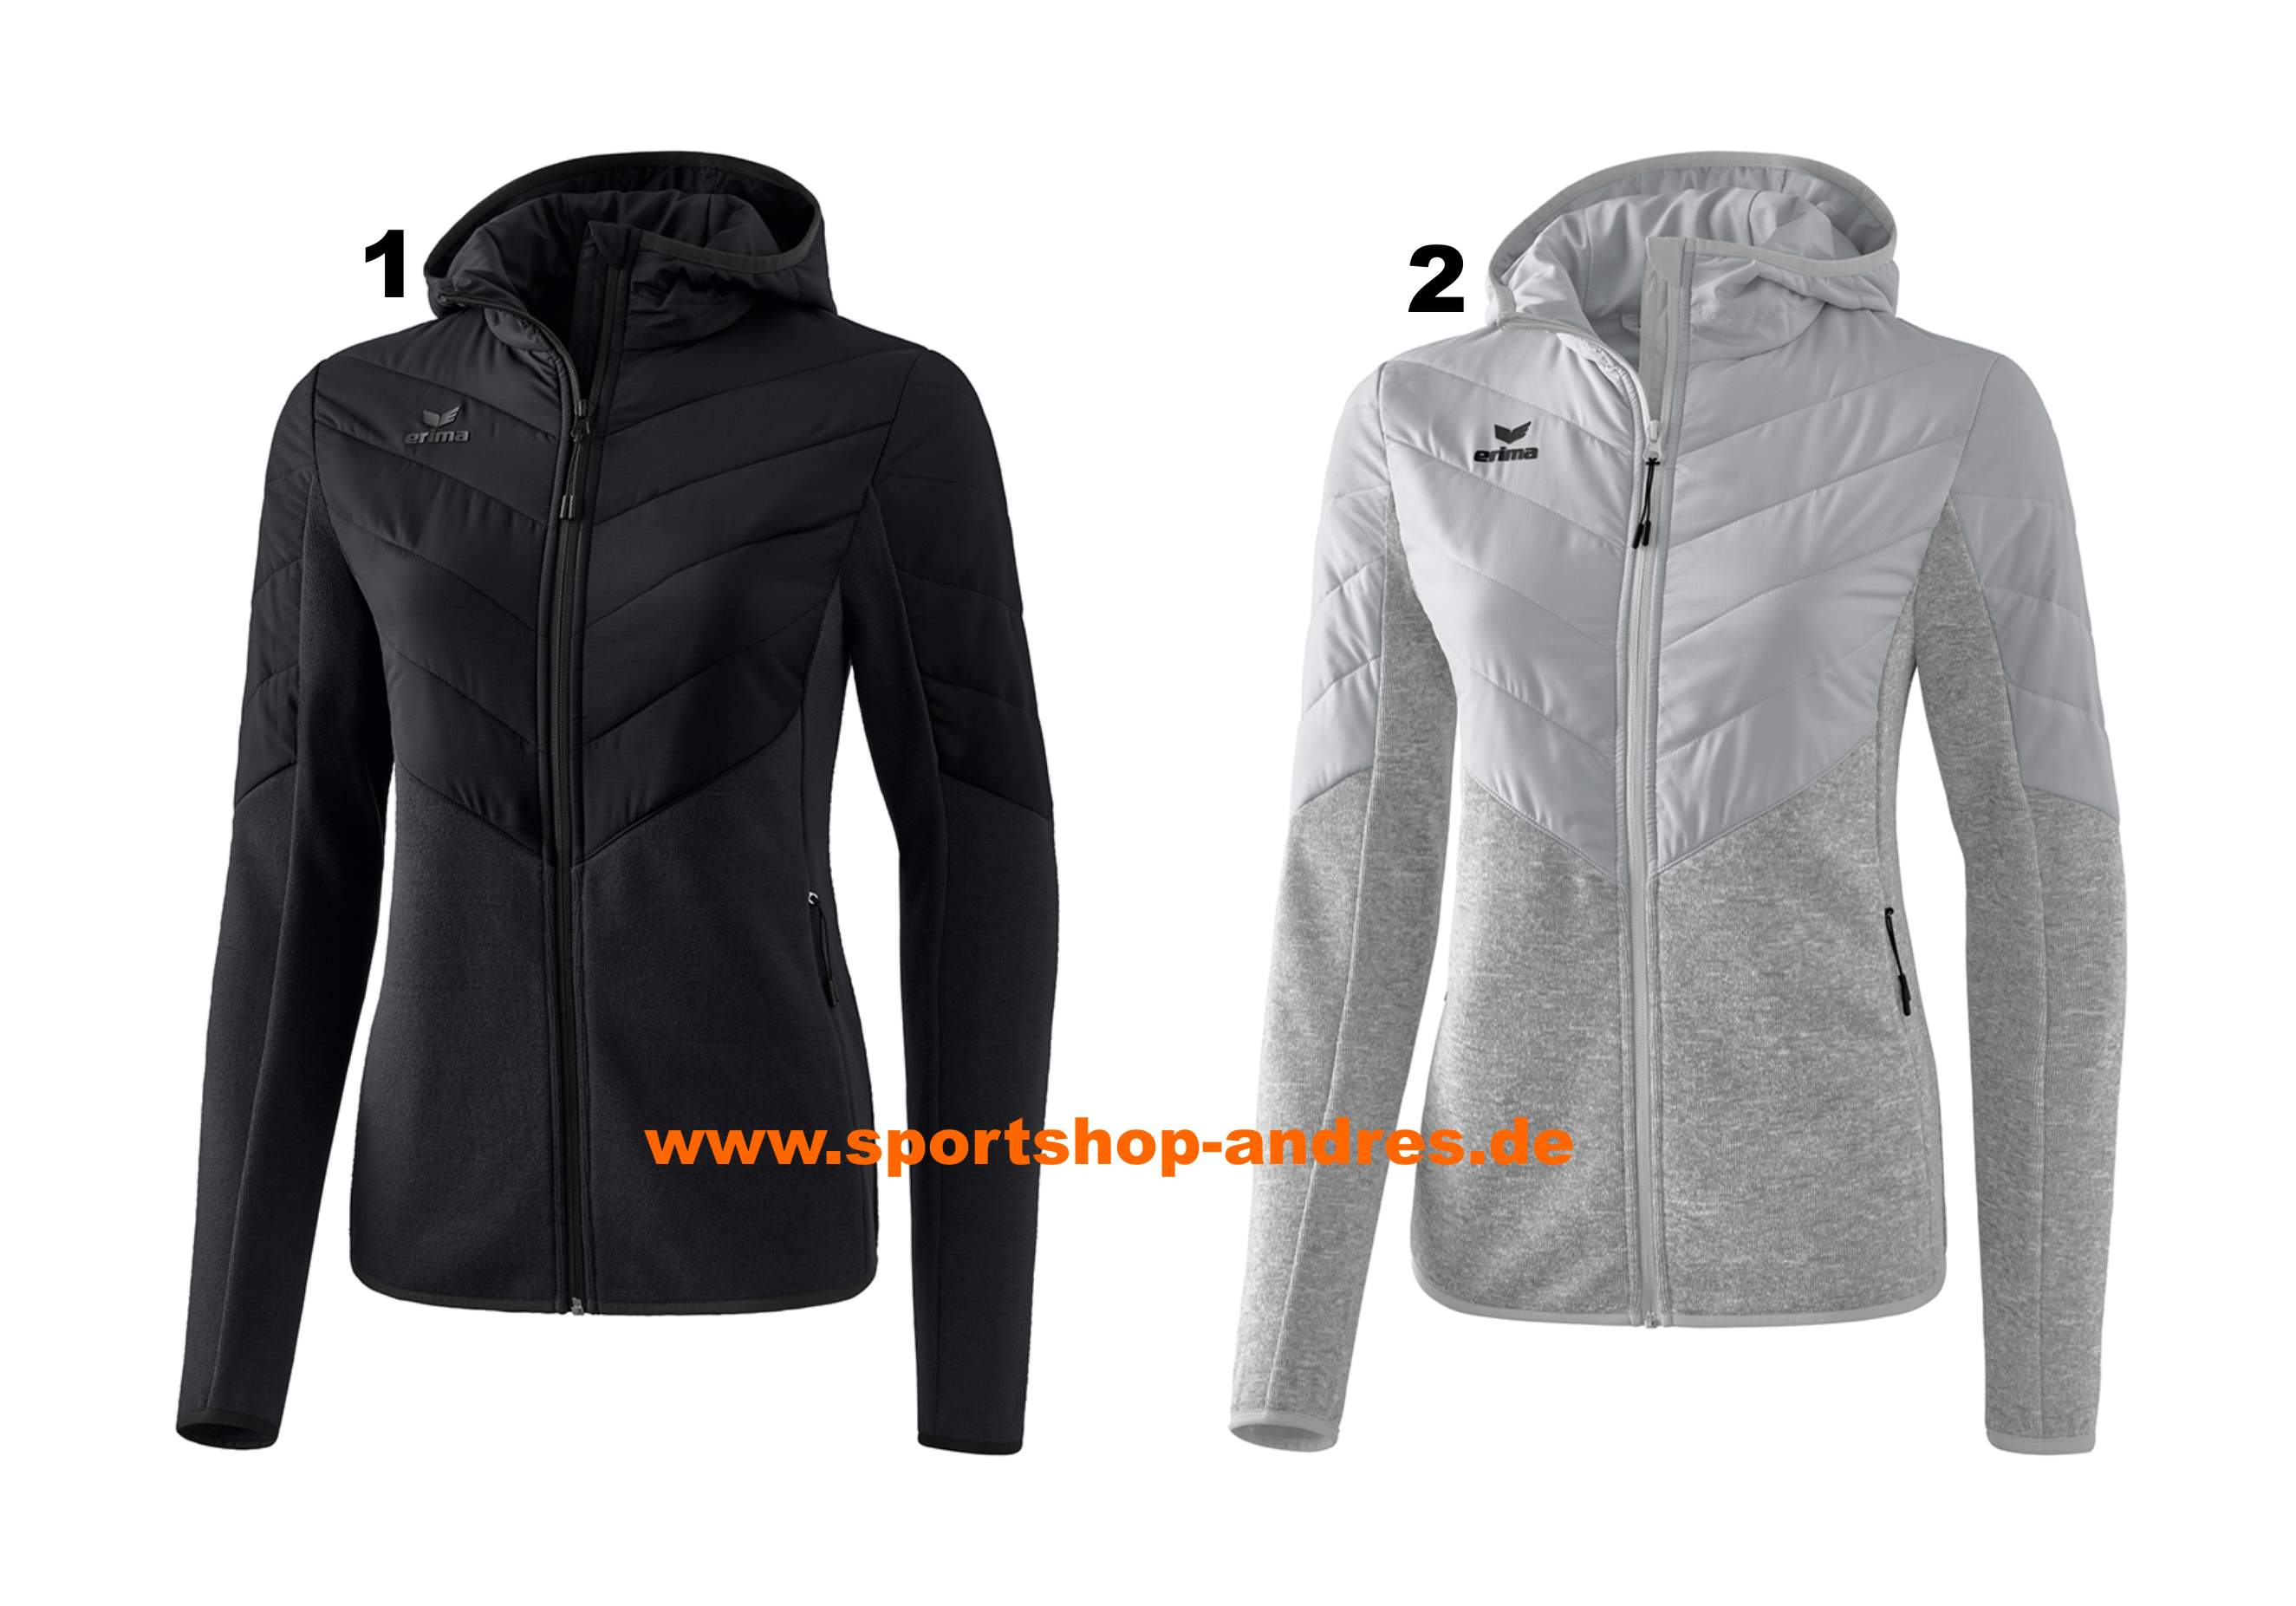 Erima Stepp-//Strickjacke mit Kapuze Damen Outdoor Frauen Winterjacke Fleece